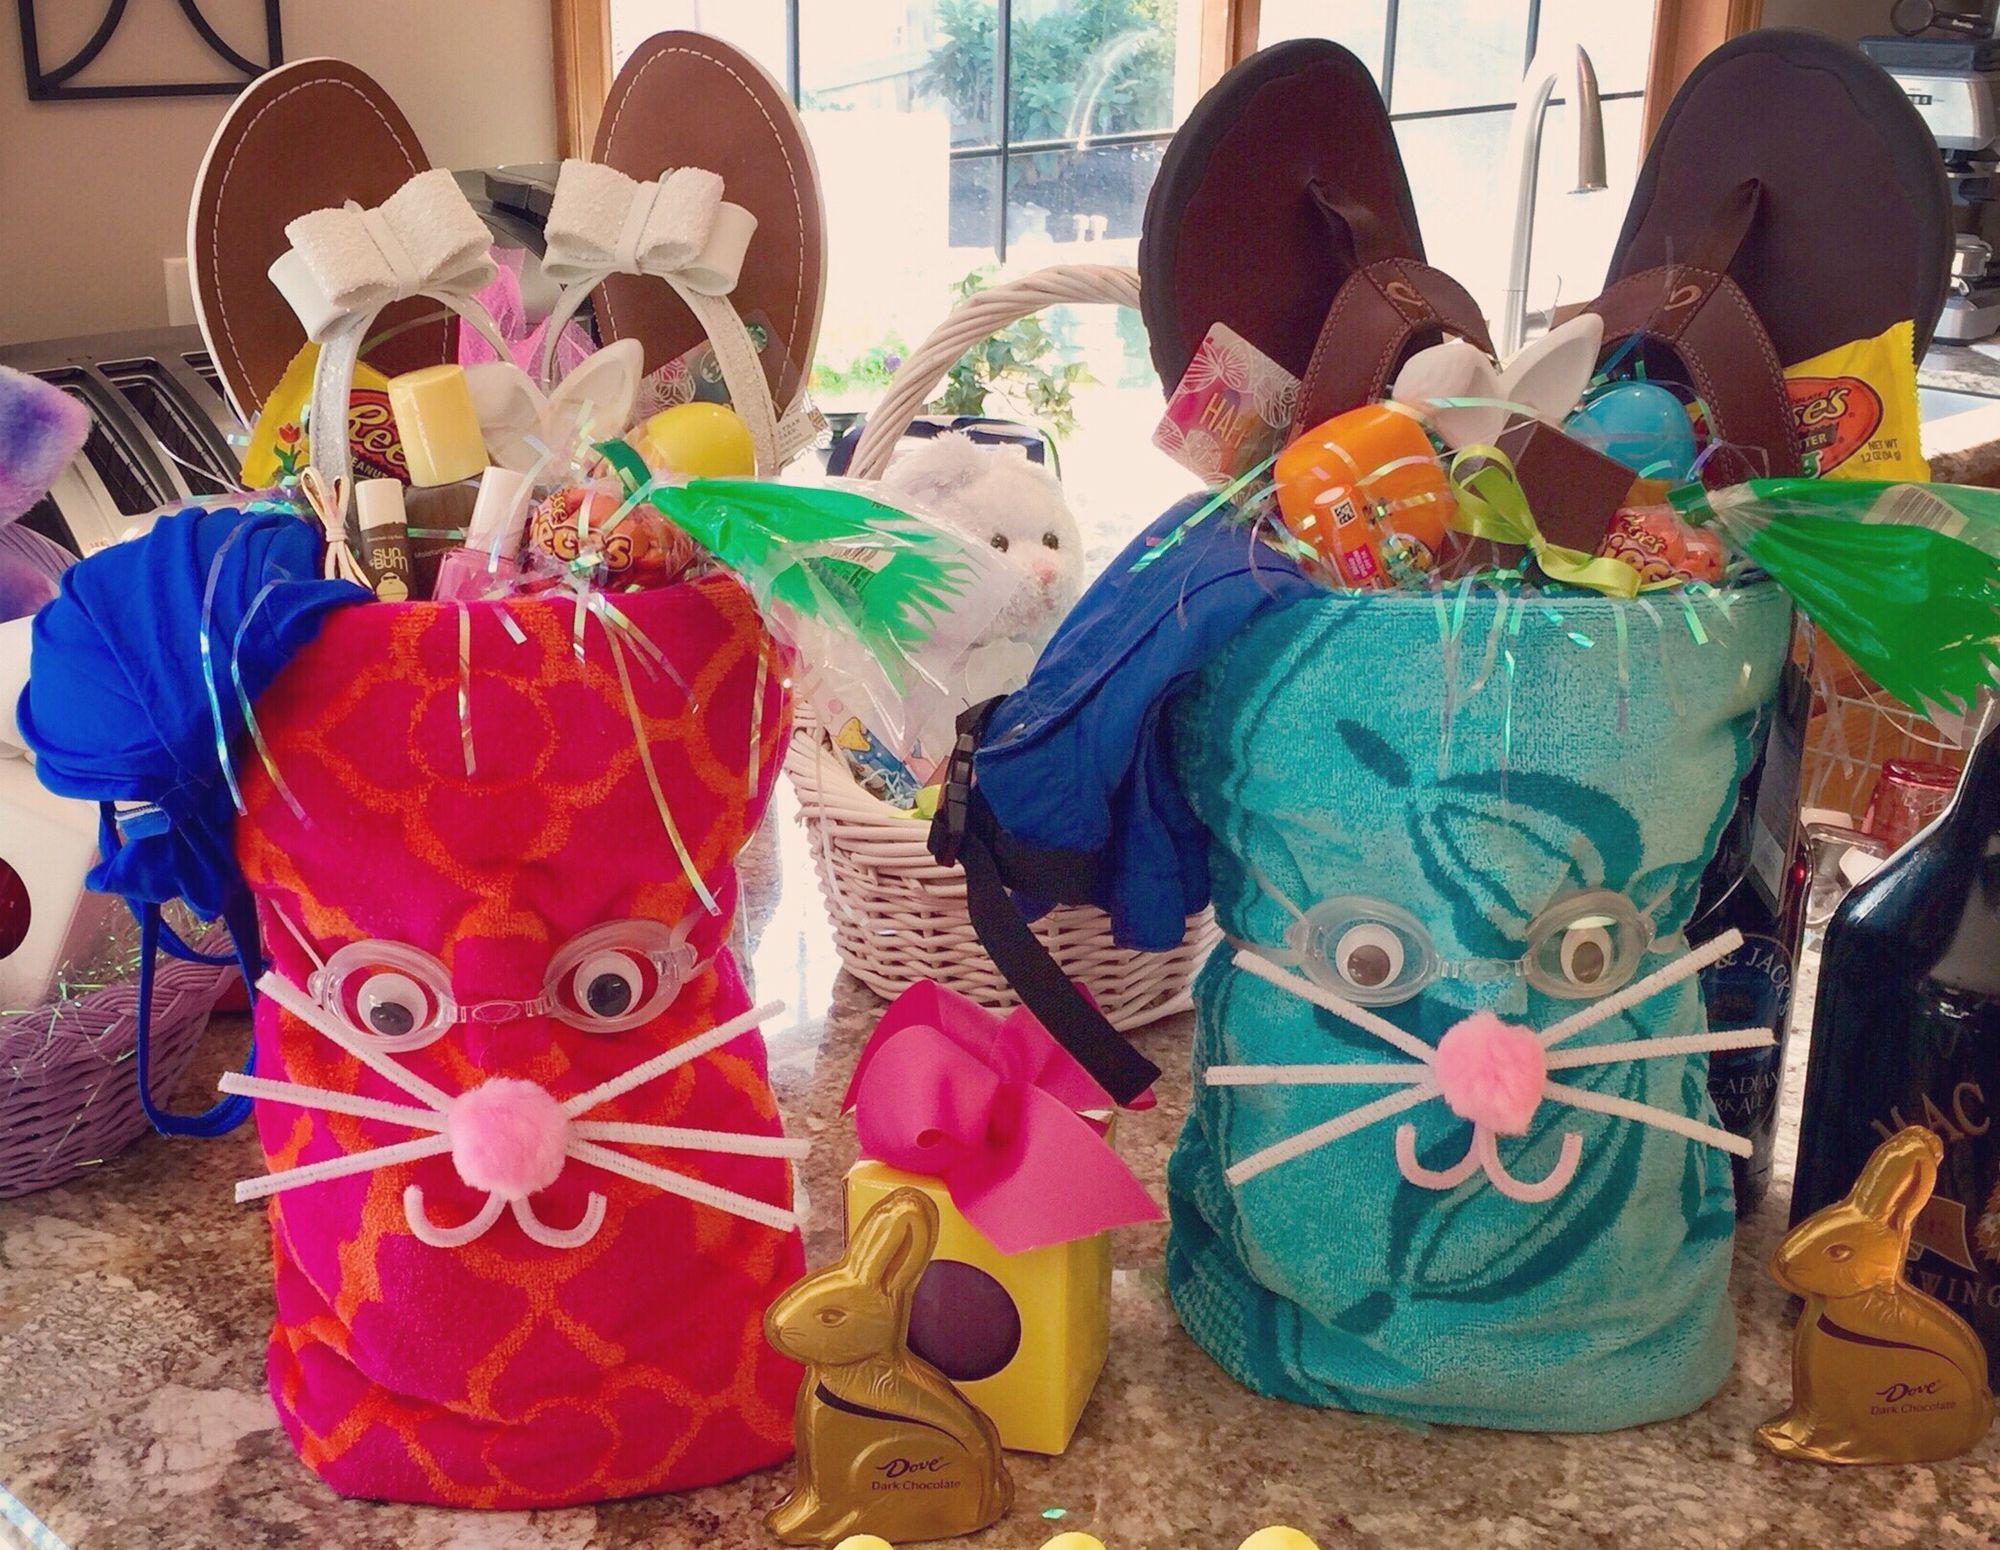 Summer Swim Easter Bunny Basket Roll A Beach Towel Add Flip Flops For The